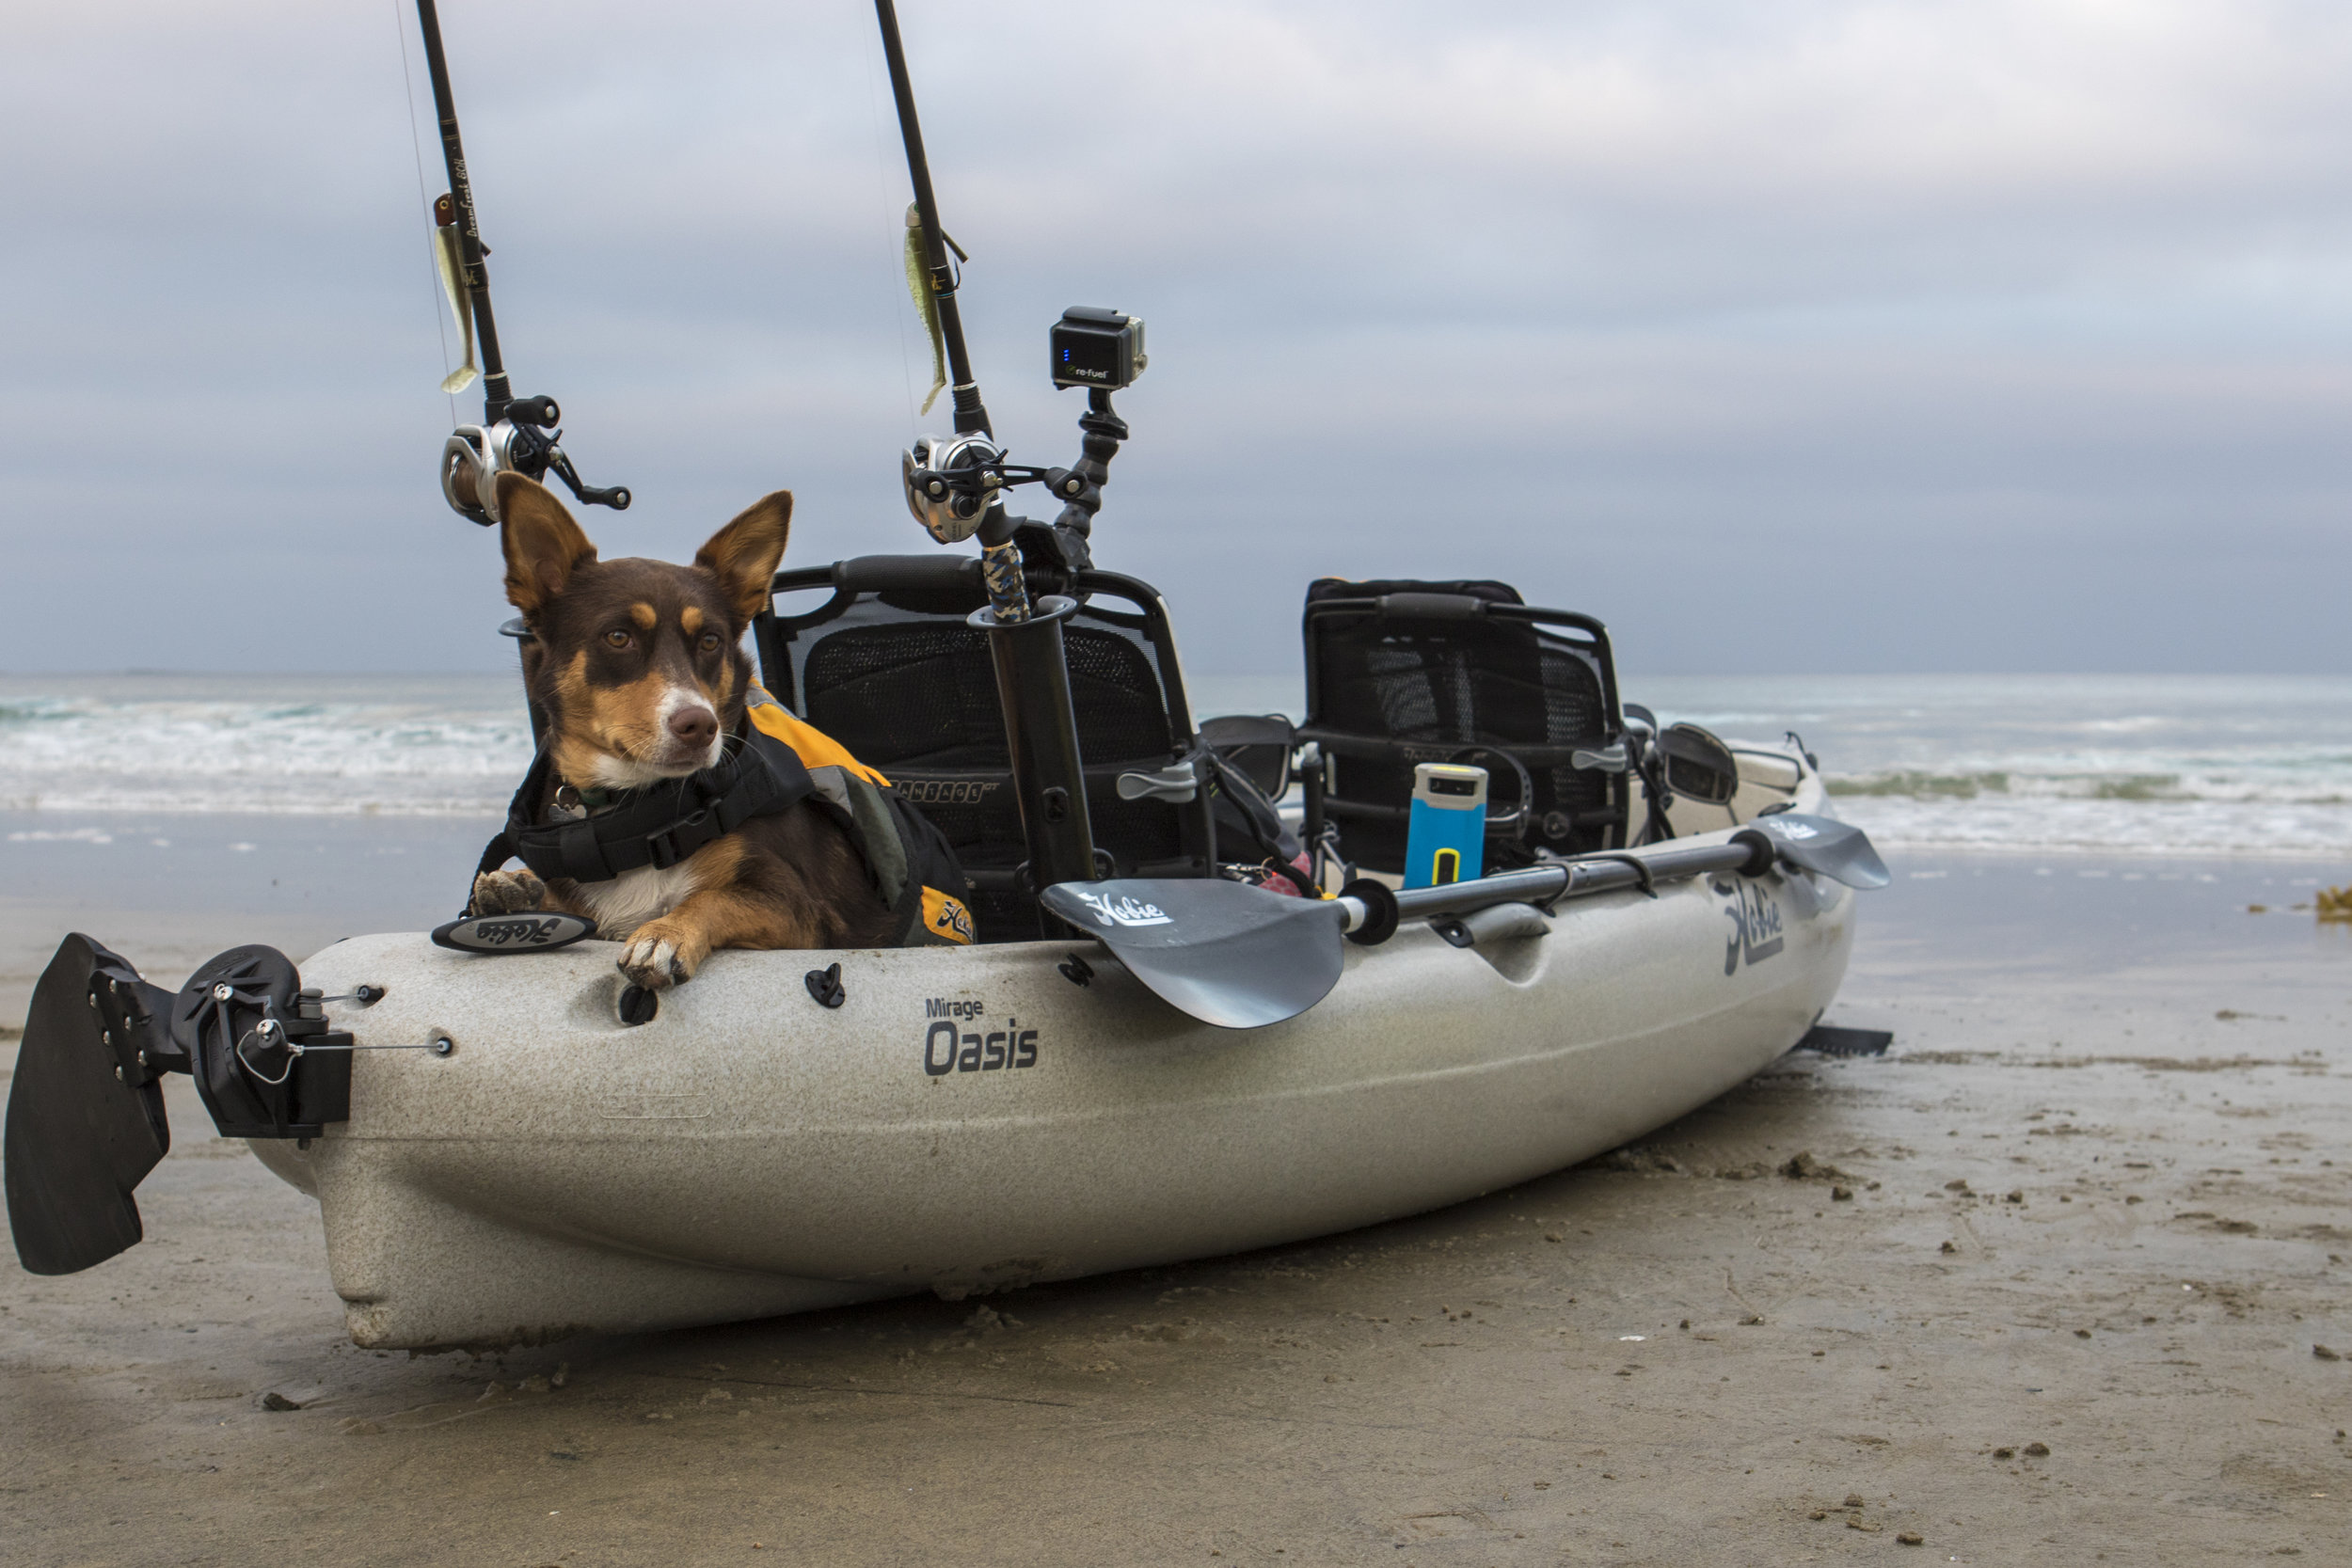 Oasis_action_fishing_beach_dog_roo_Ocean.jpg